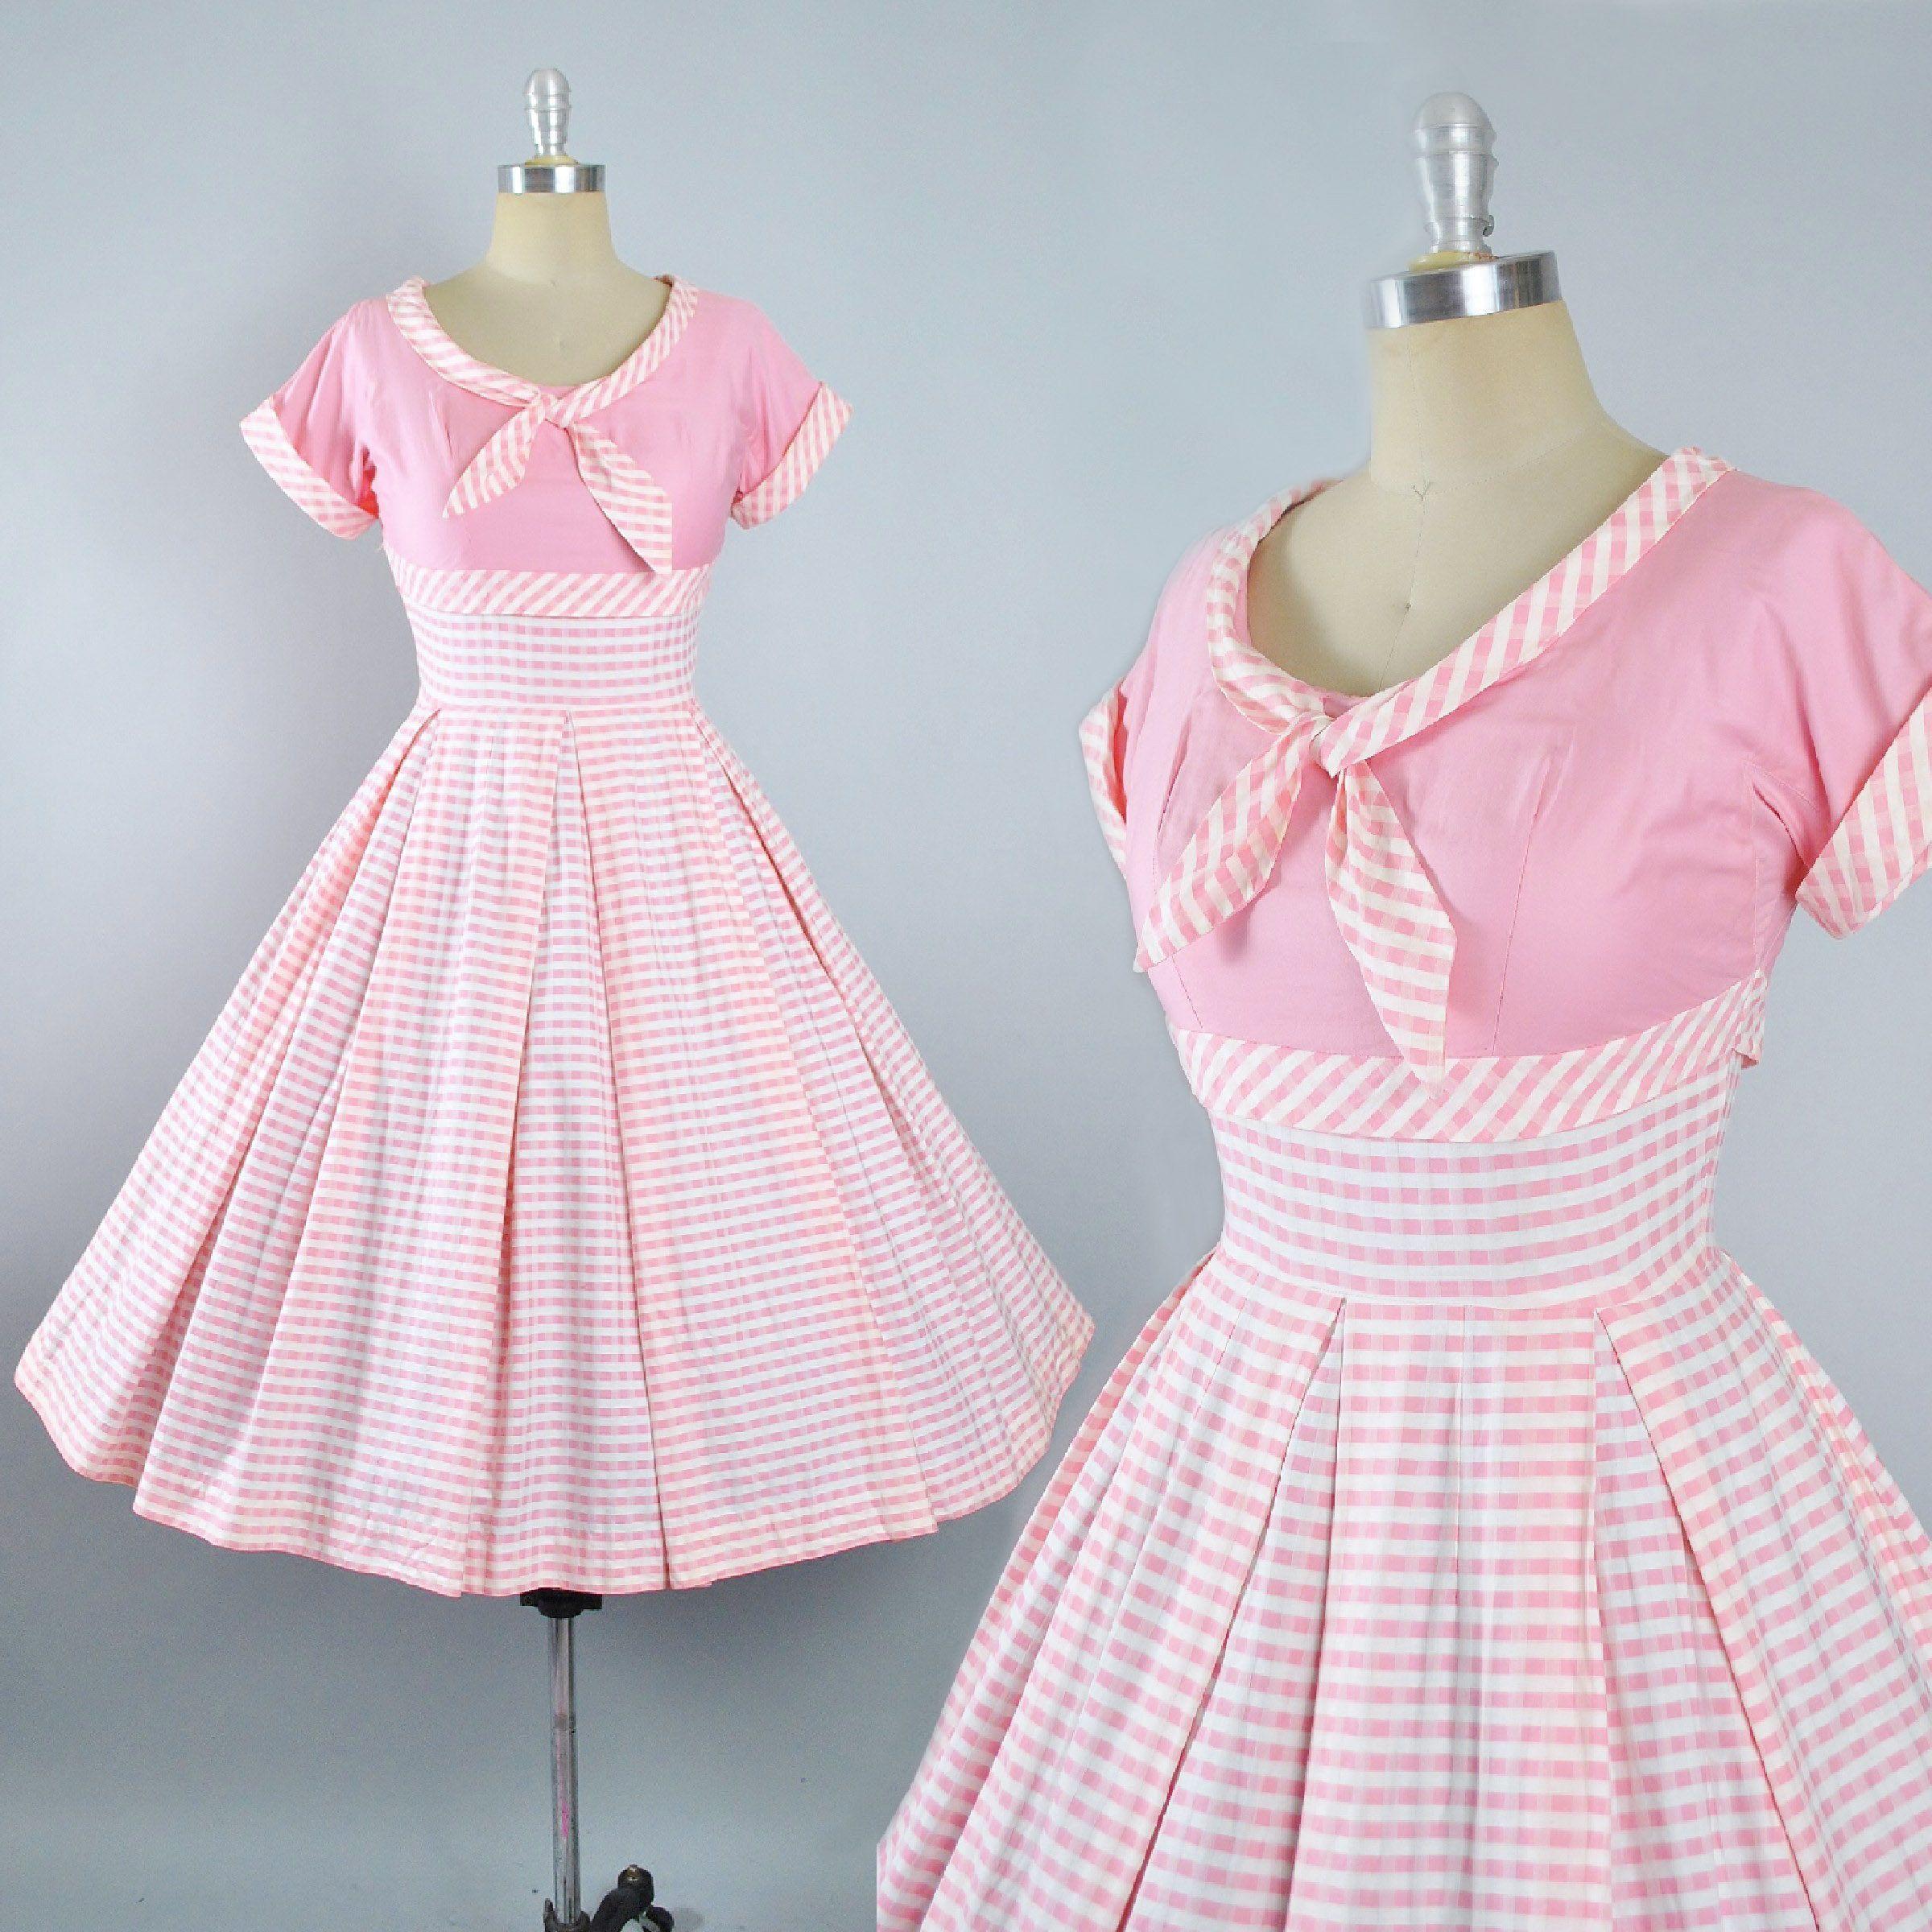 Vintage 50s Dress / 1950s Cotton Sundress White PINK STRIPES Full ...